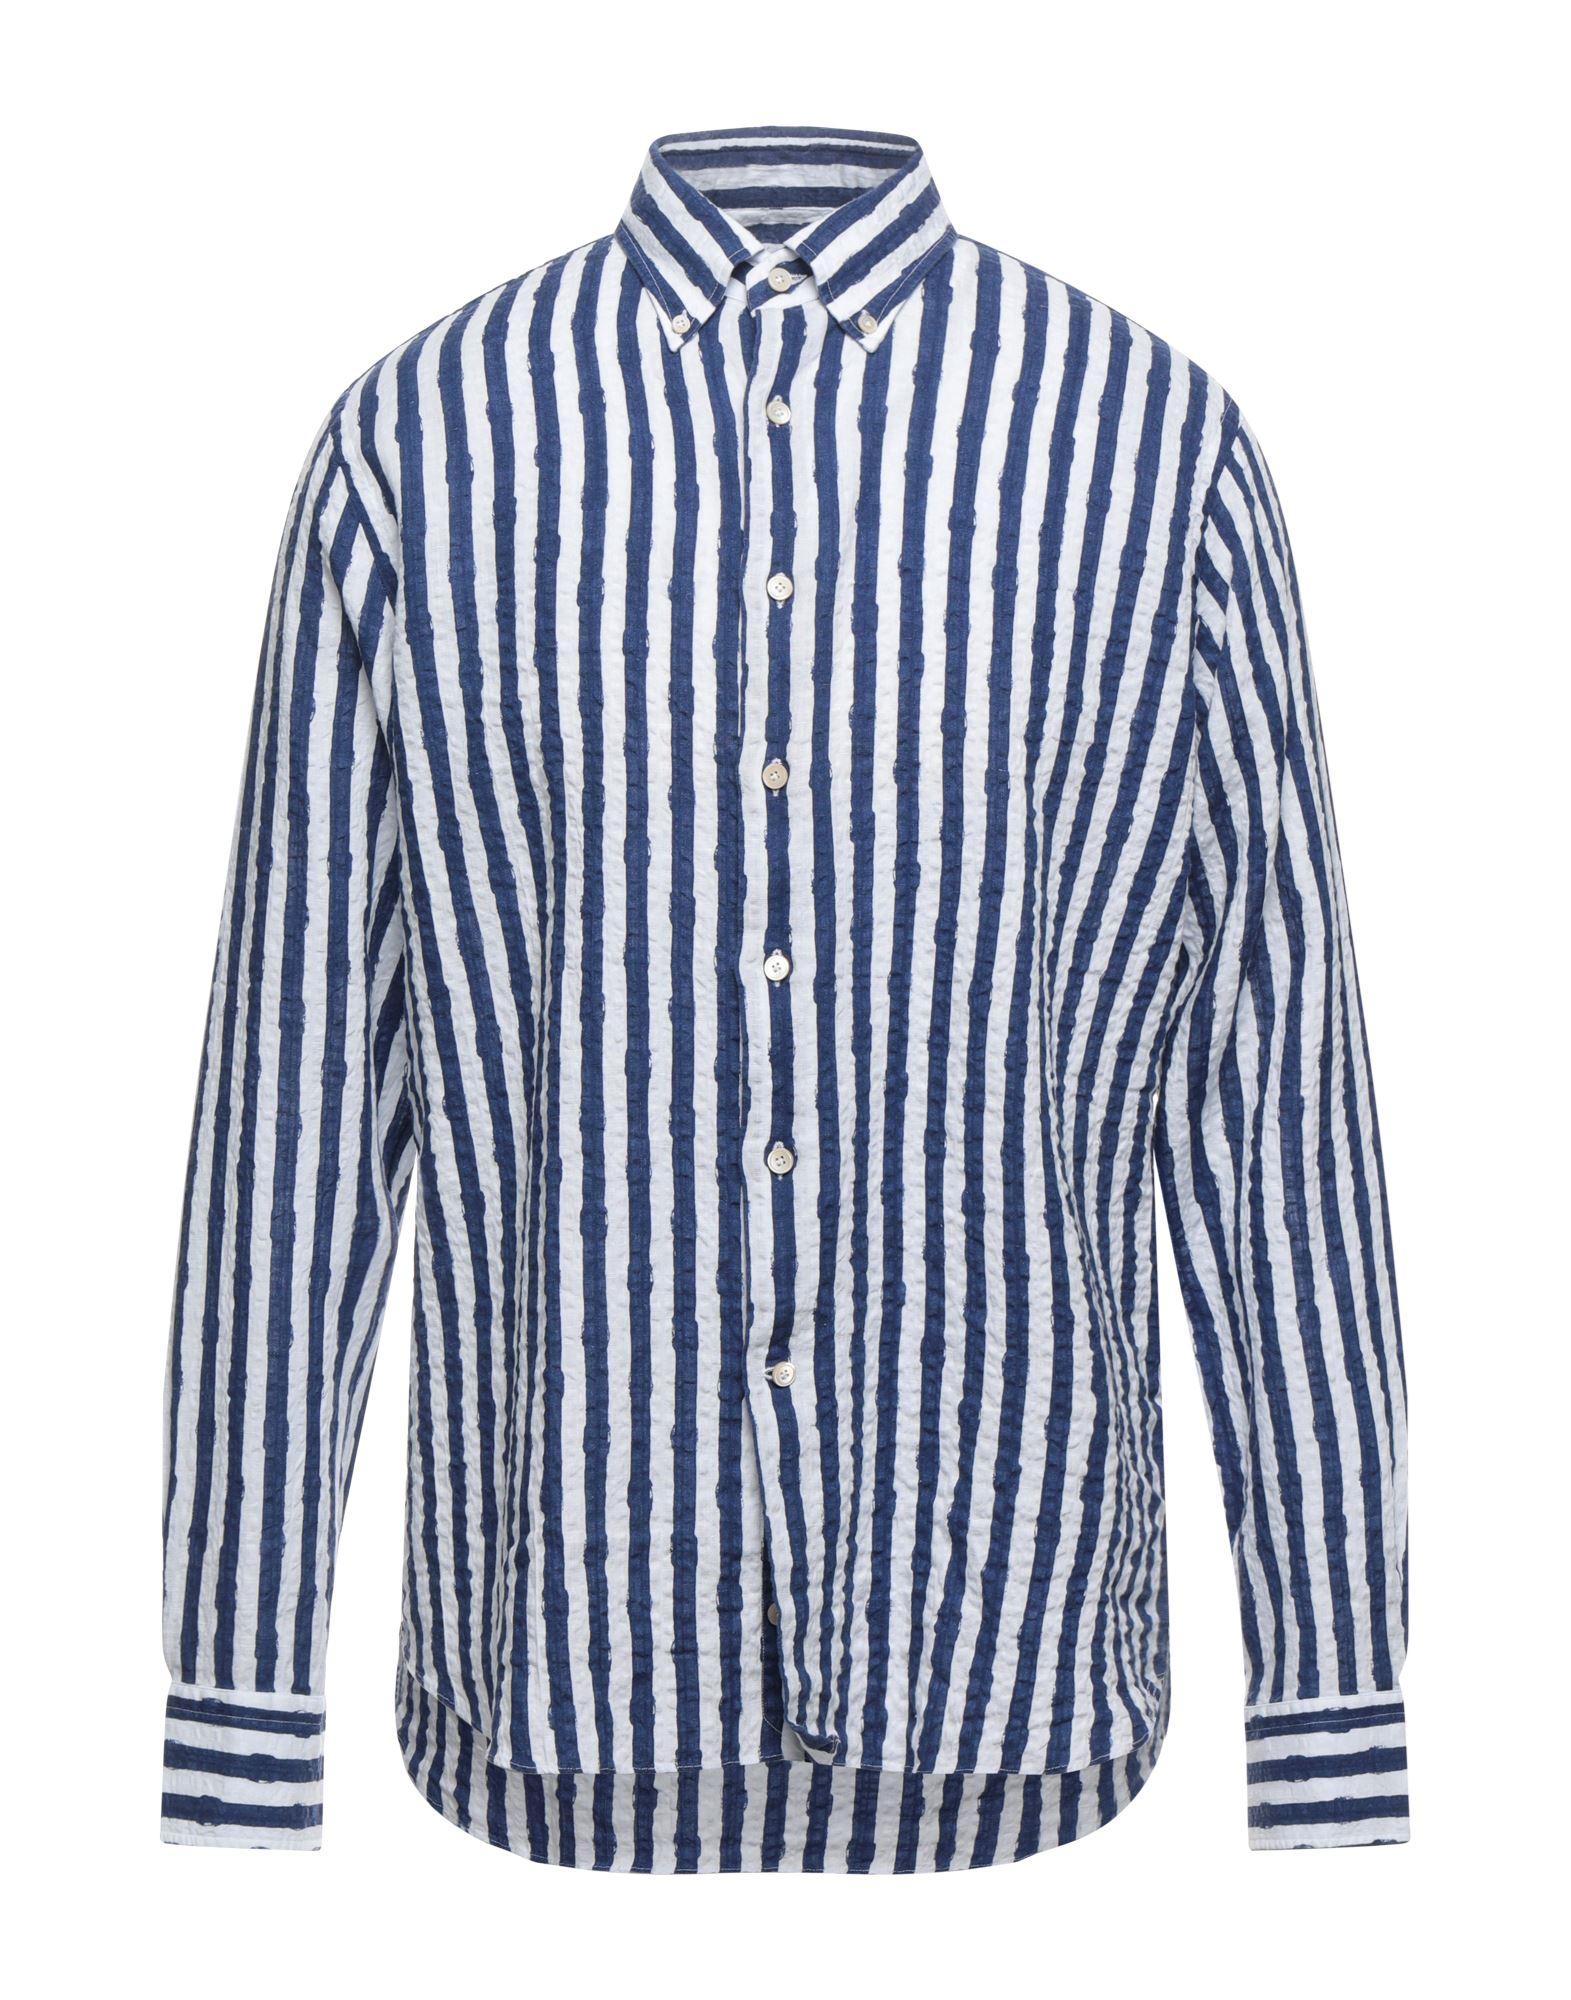 Alessandro Gherardi Shirts In Blue